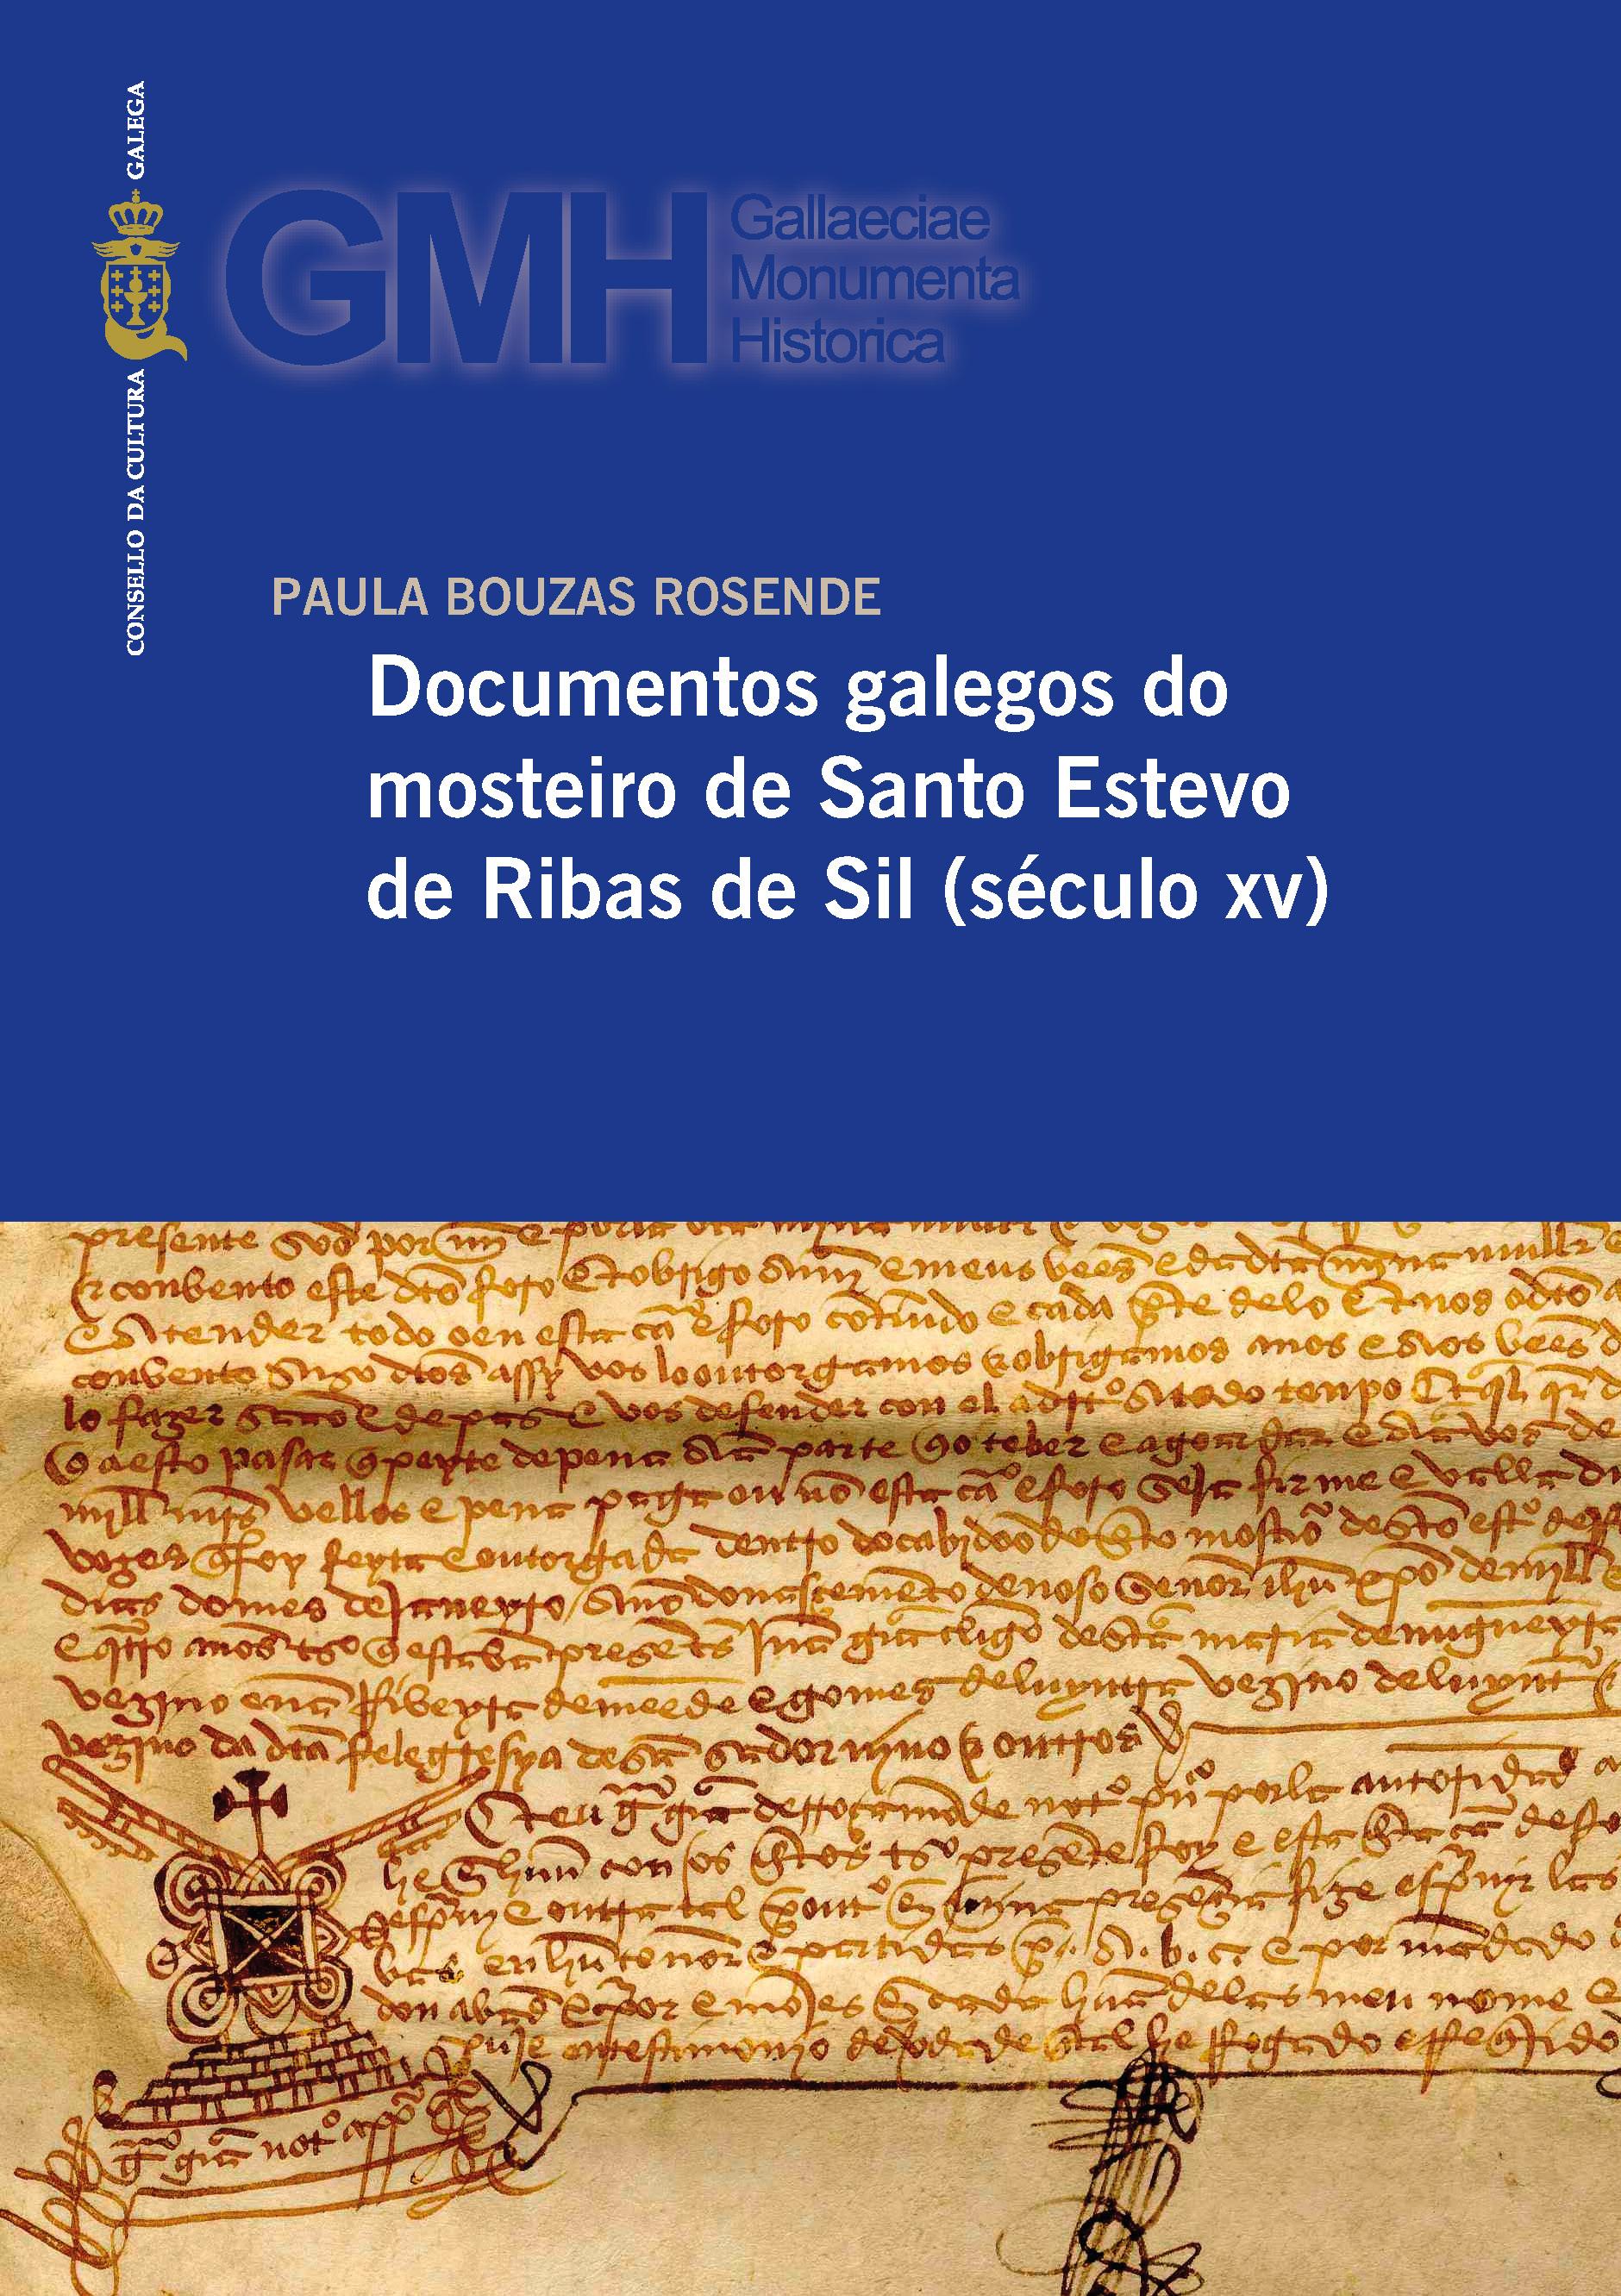 Portada de  Documentos galegos do mosteiro de Santo Estevo de Ribas de Sil (século XV)